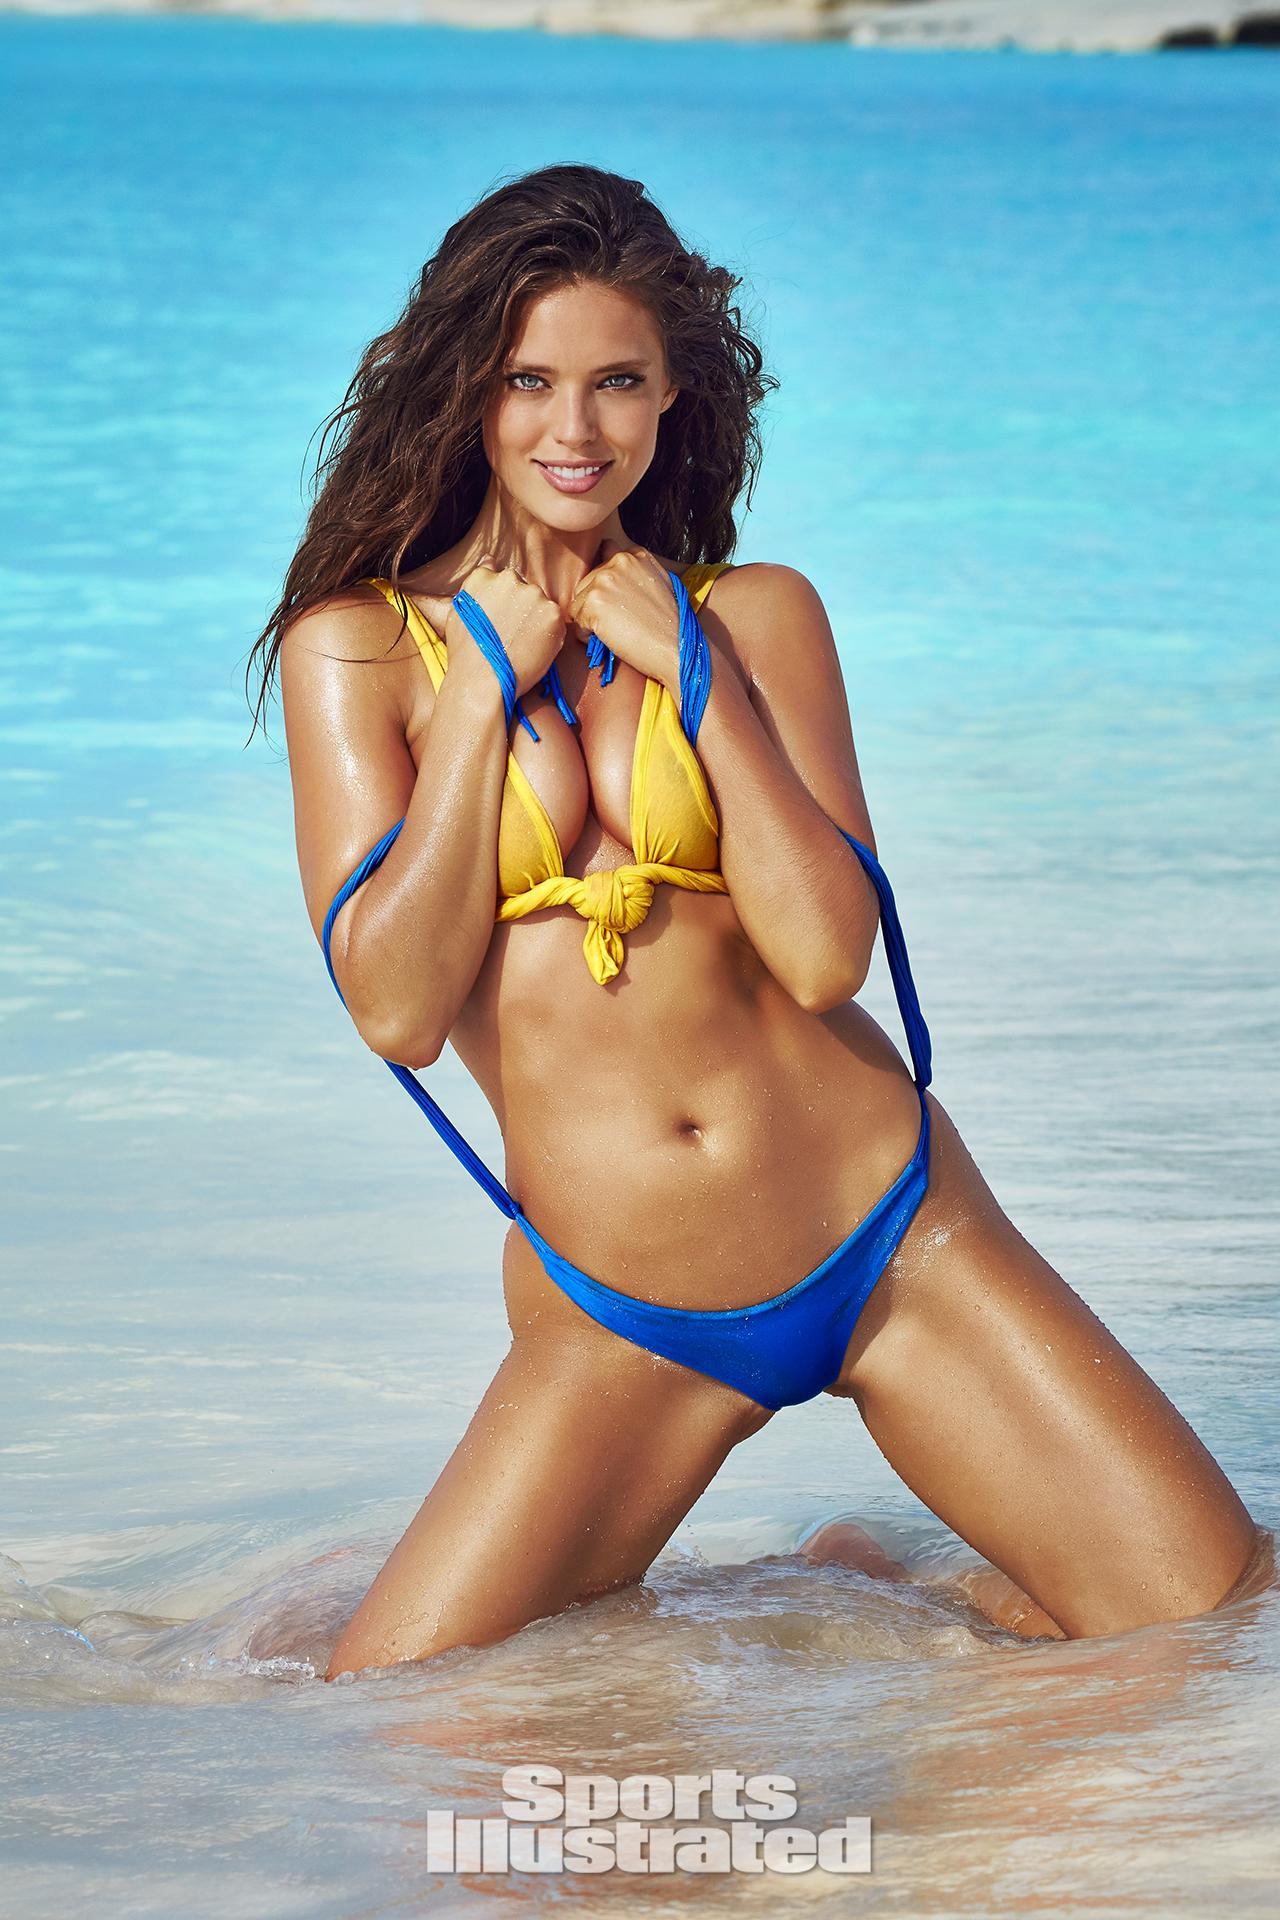 emily didonato swimsuit photos sports illustrated swimsuit 2016